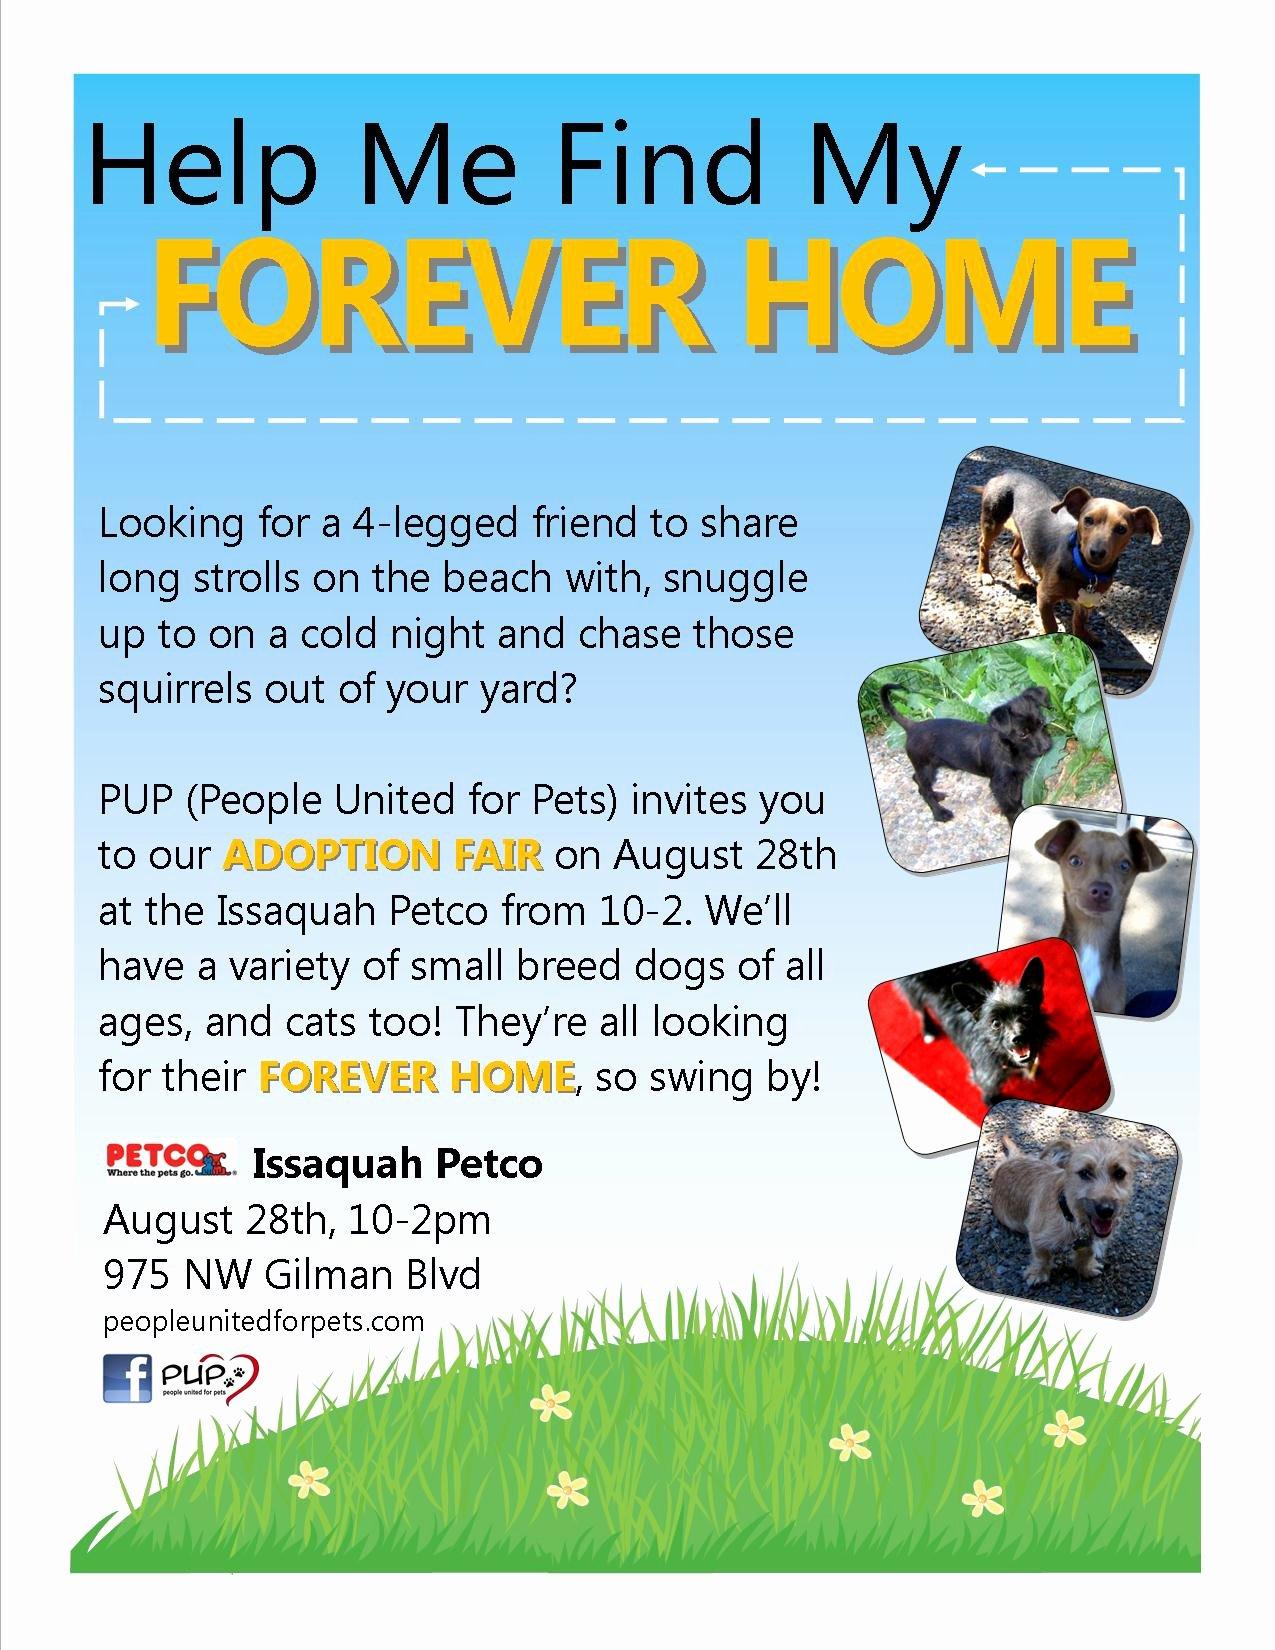 Pet Adoption Flyer Template Fresh Pup Dog Rescue Flyers – Portfolio Michelle Fears